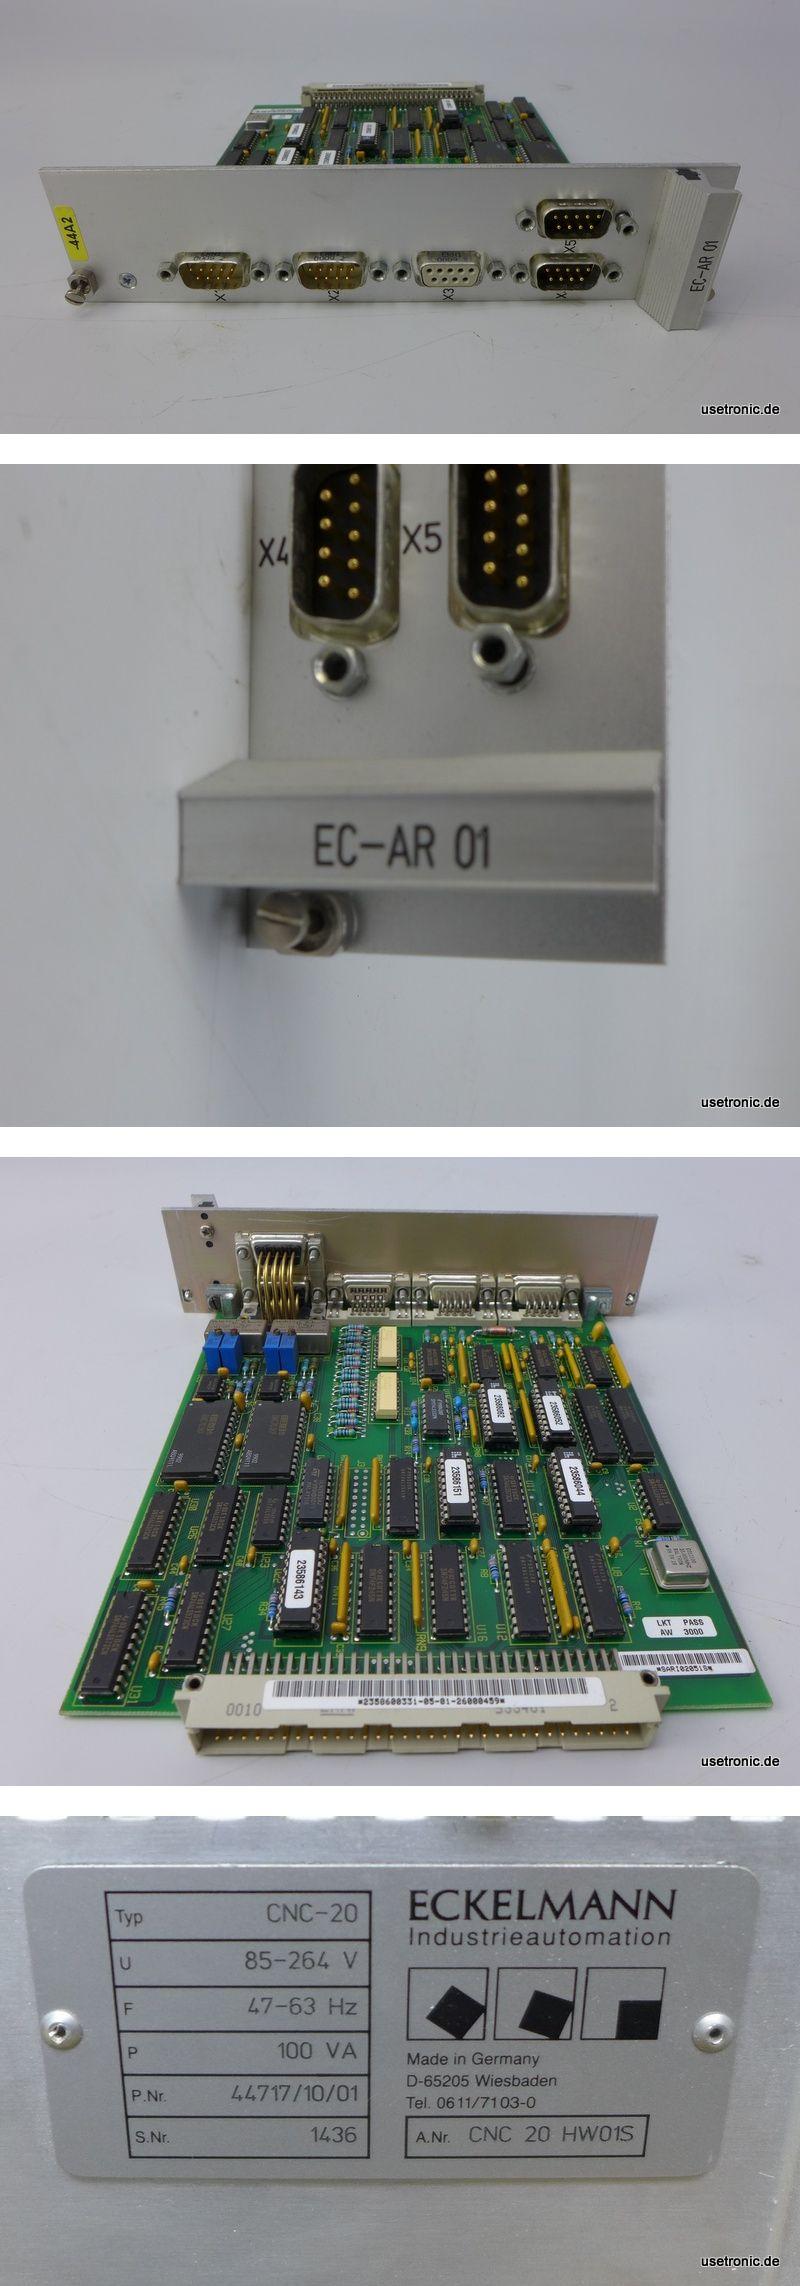 Eckelman EC-AR 01